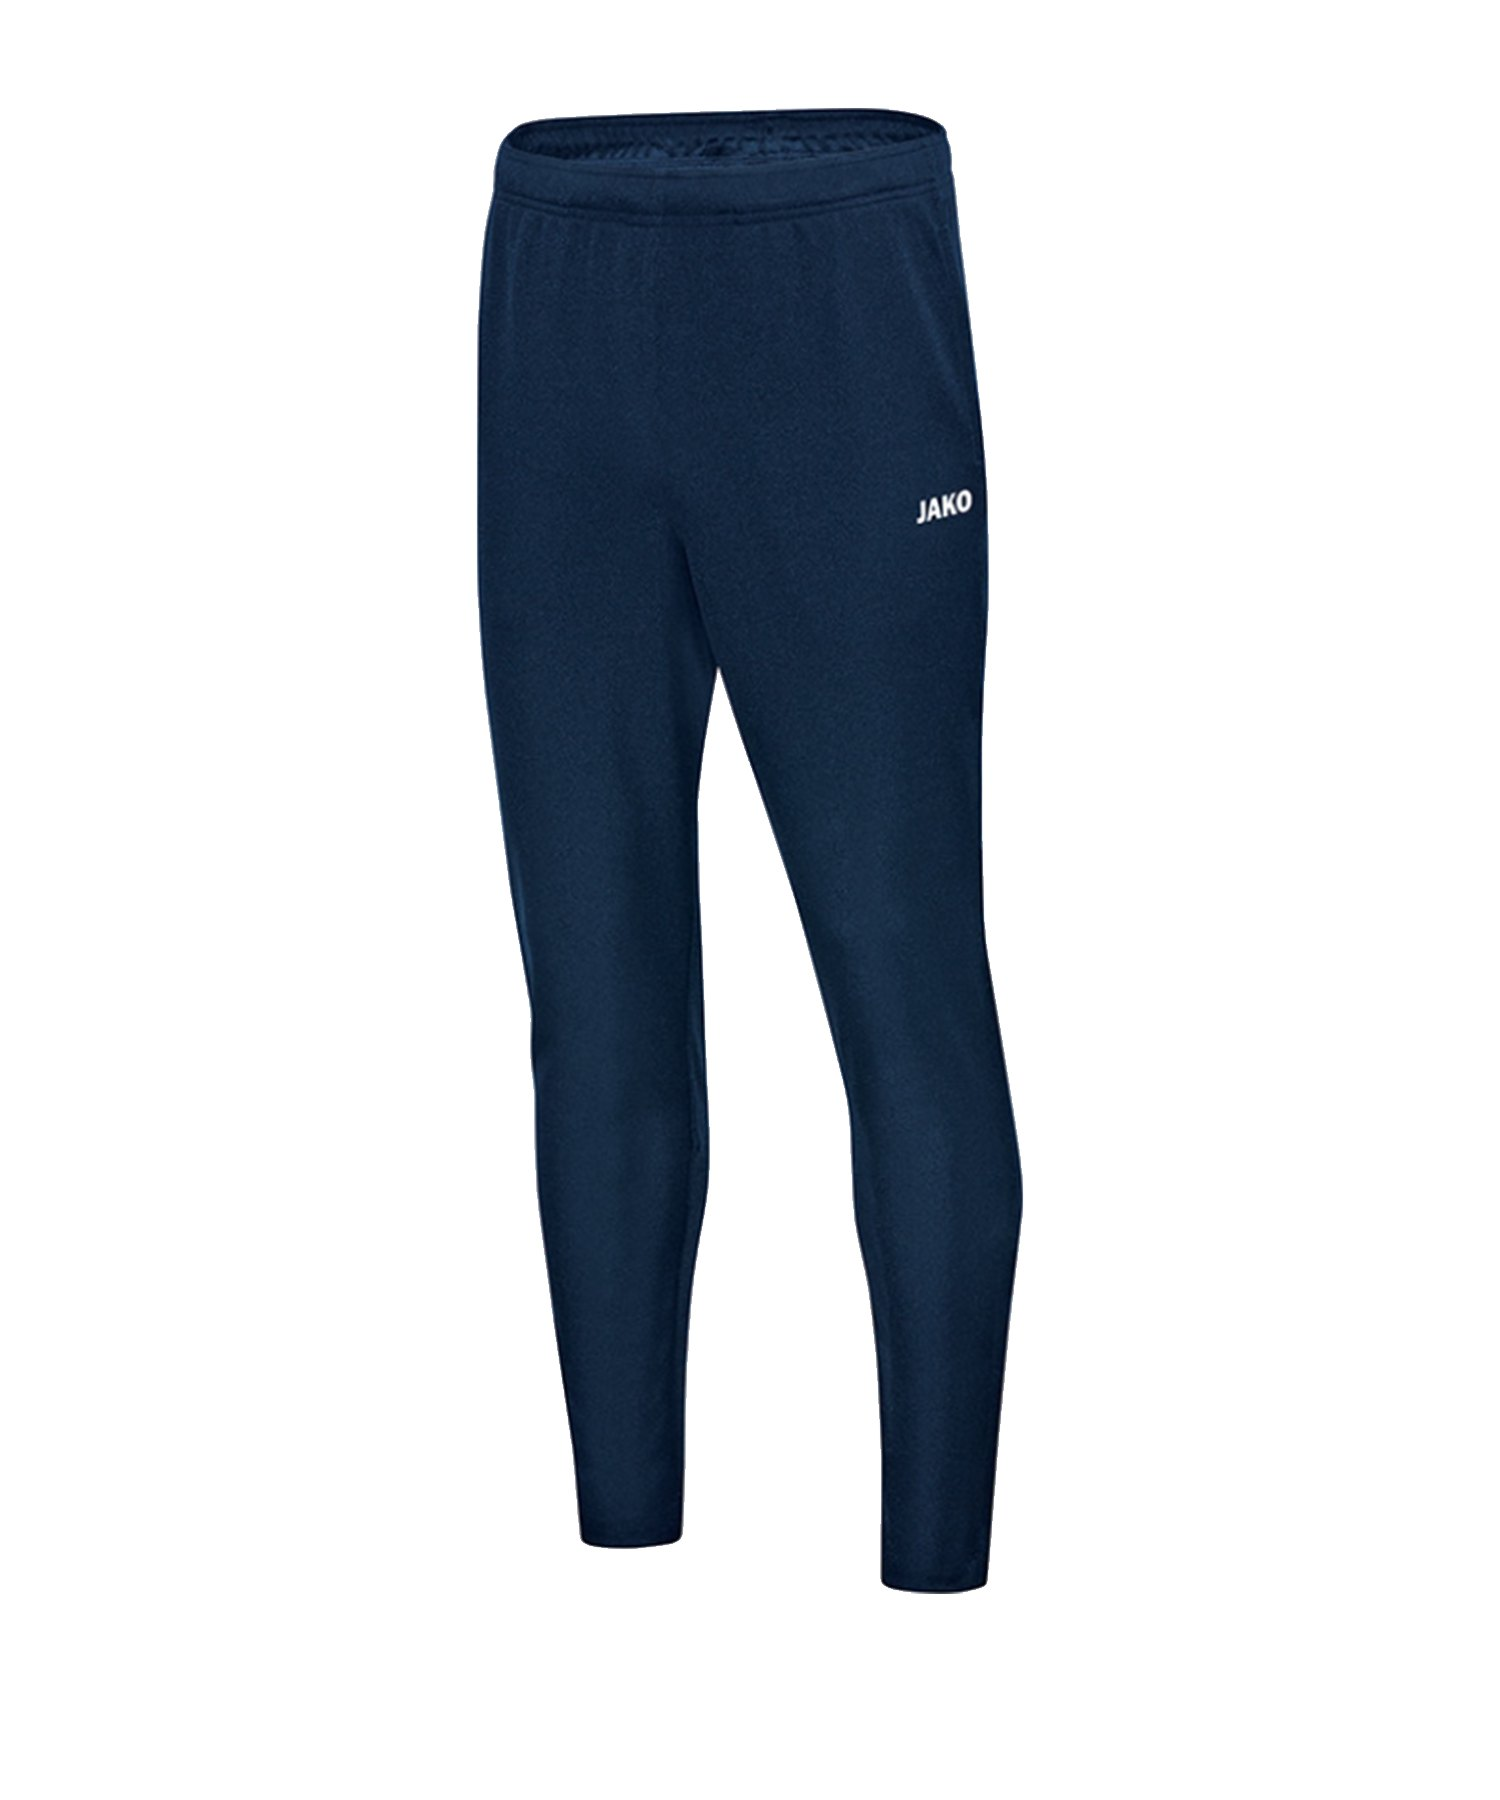 JAKO Classico Trainingshose Langgröße Blau F09 - blau